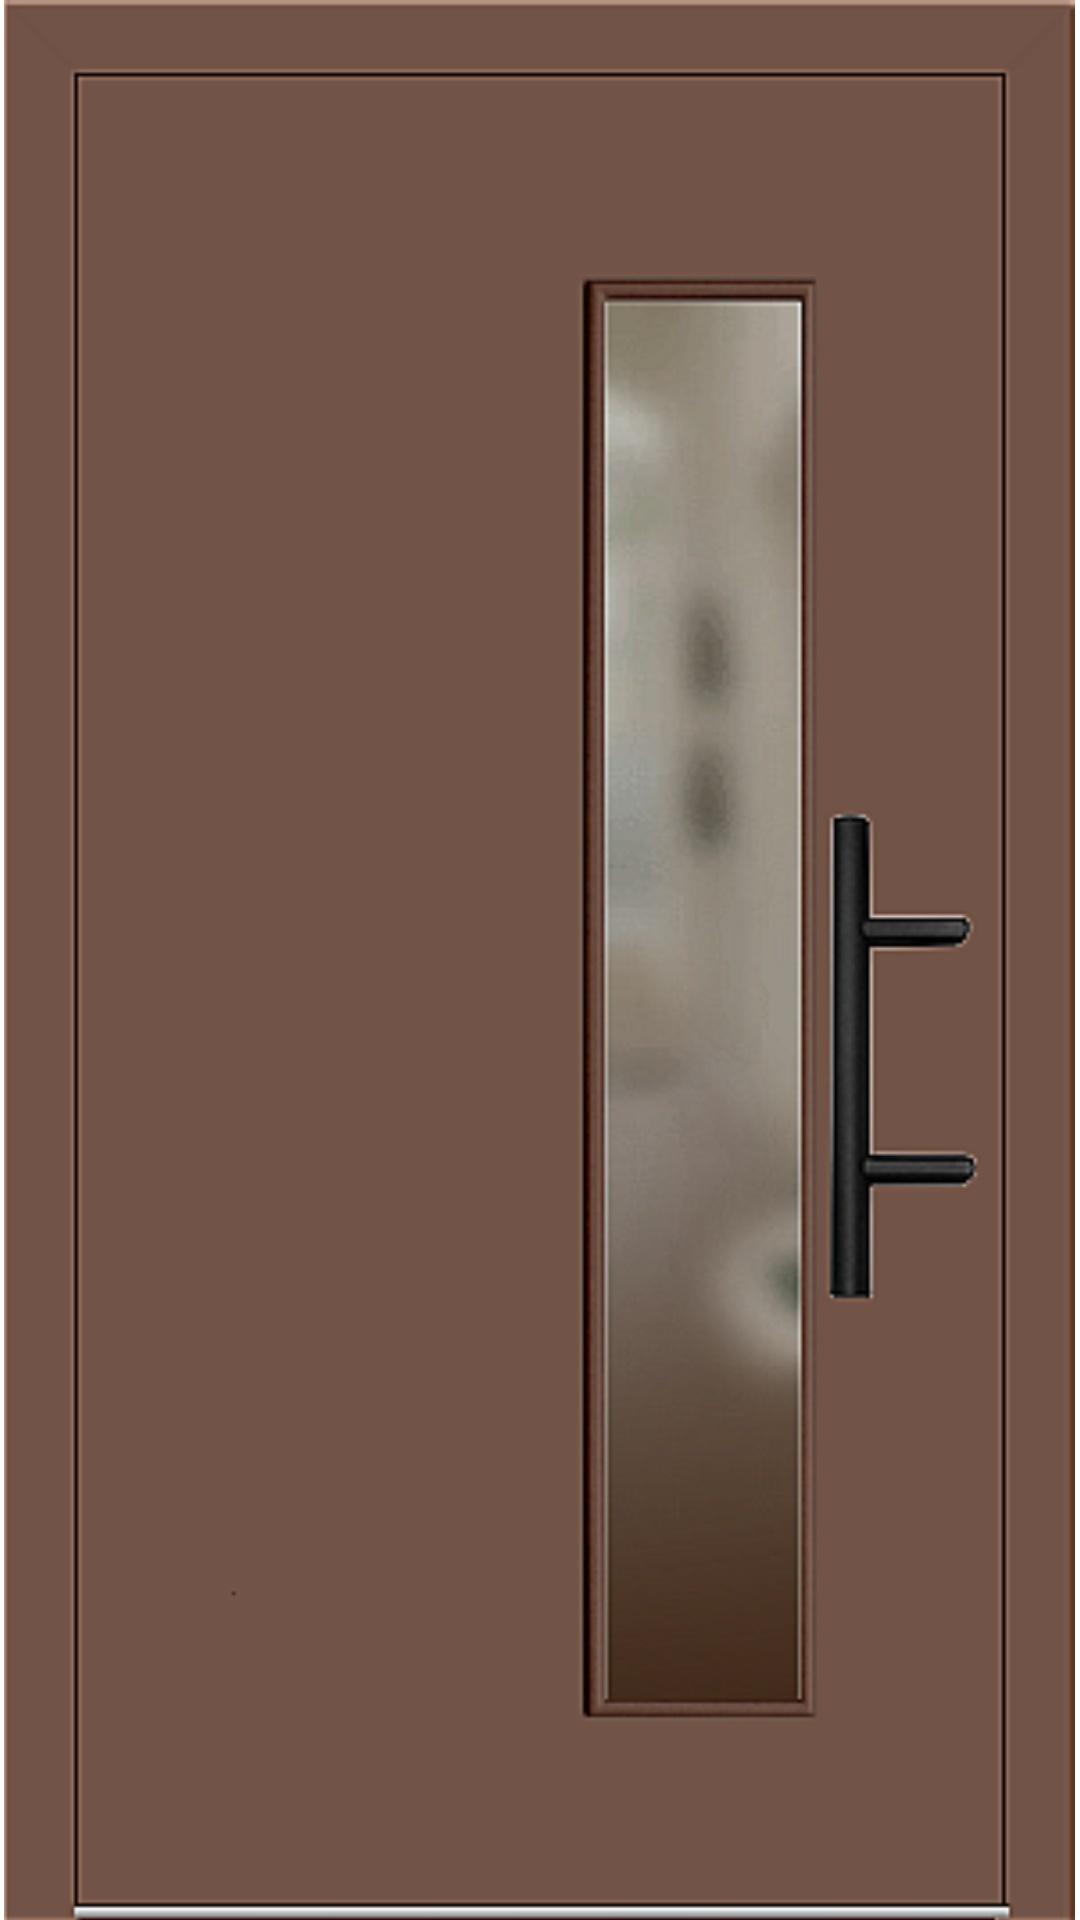 Holz Haustür Modell 8070 lehmbraun